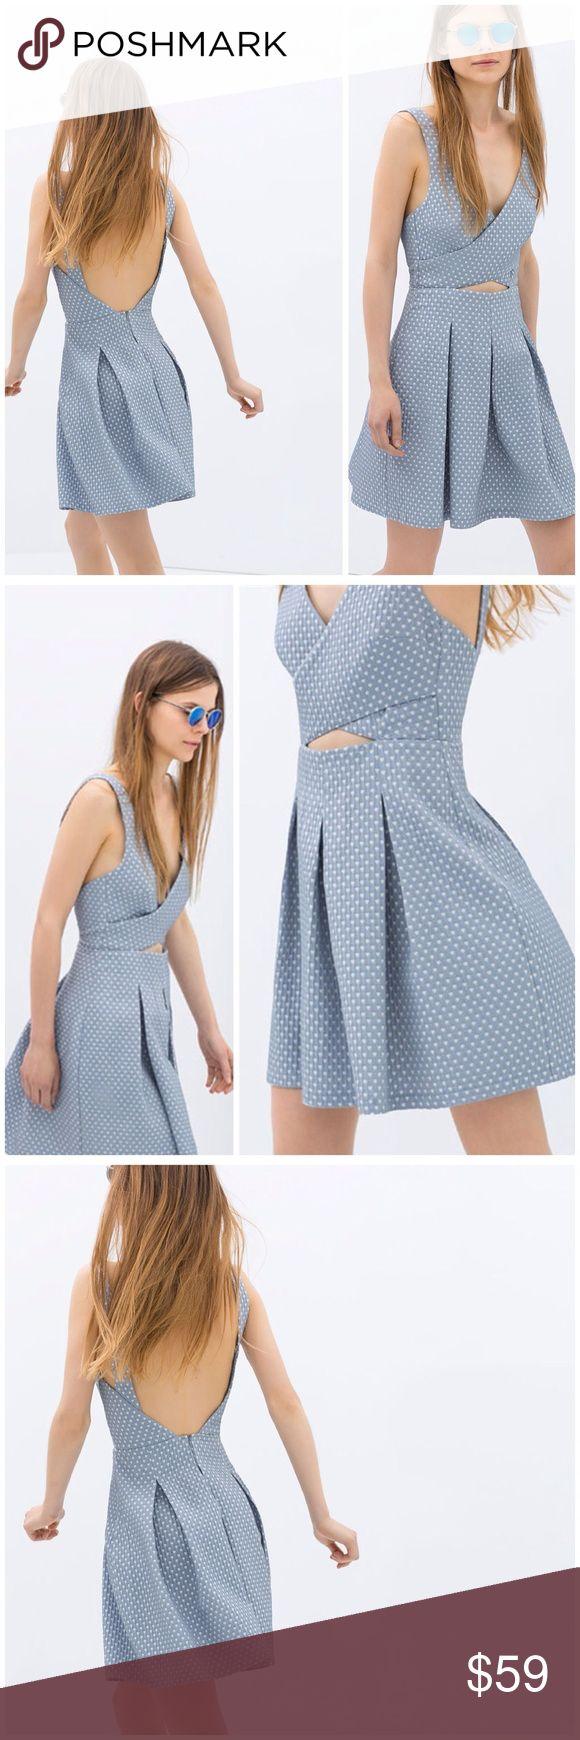 ZARA dress new with tag. Beautiful dress from ZARA. Size XS brand new with tag. Zara Dresses Mini